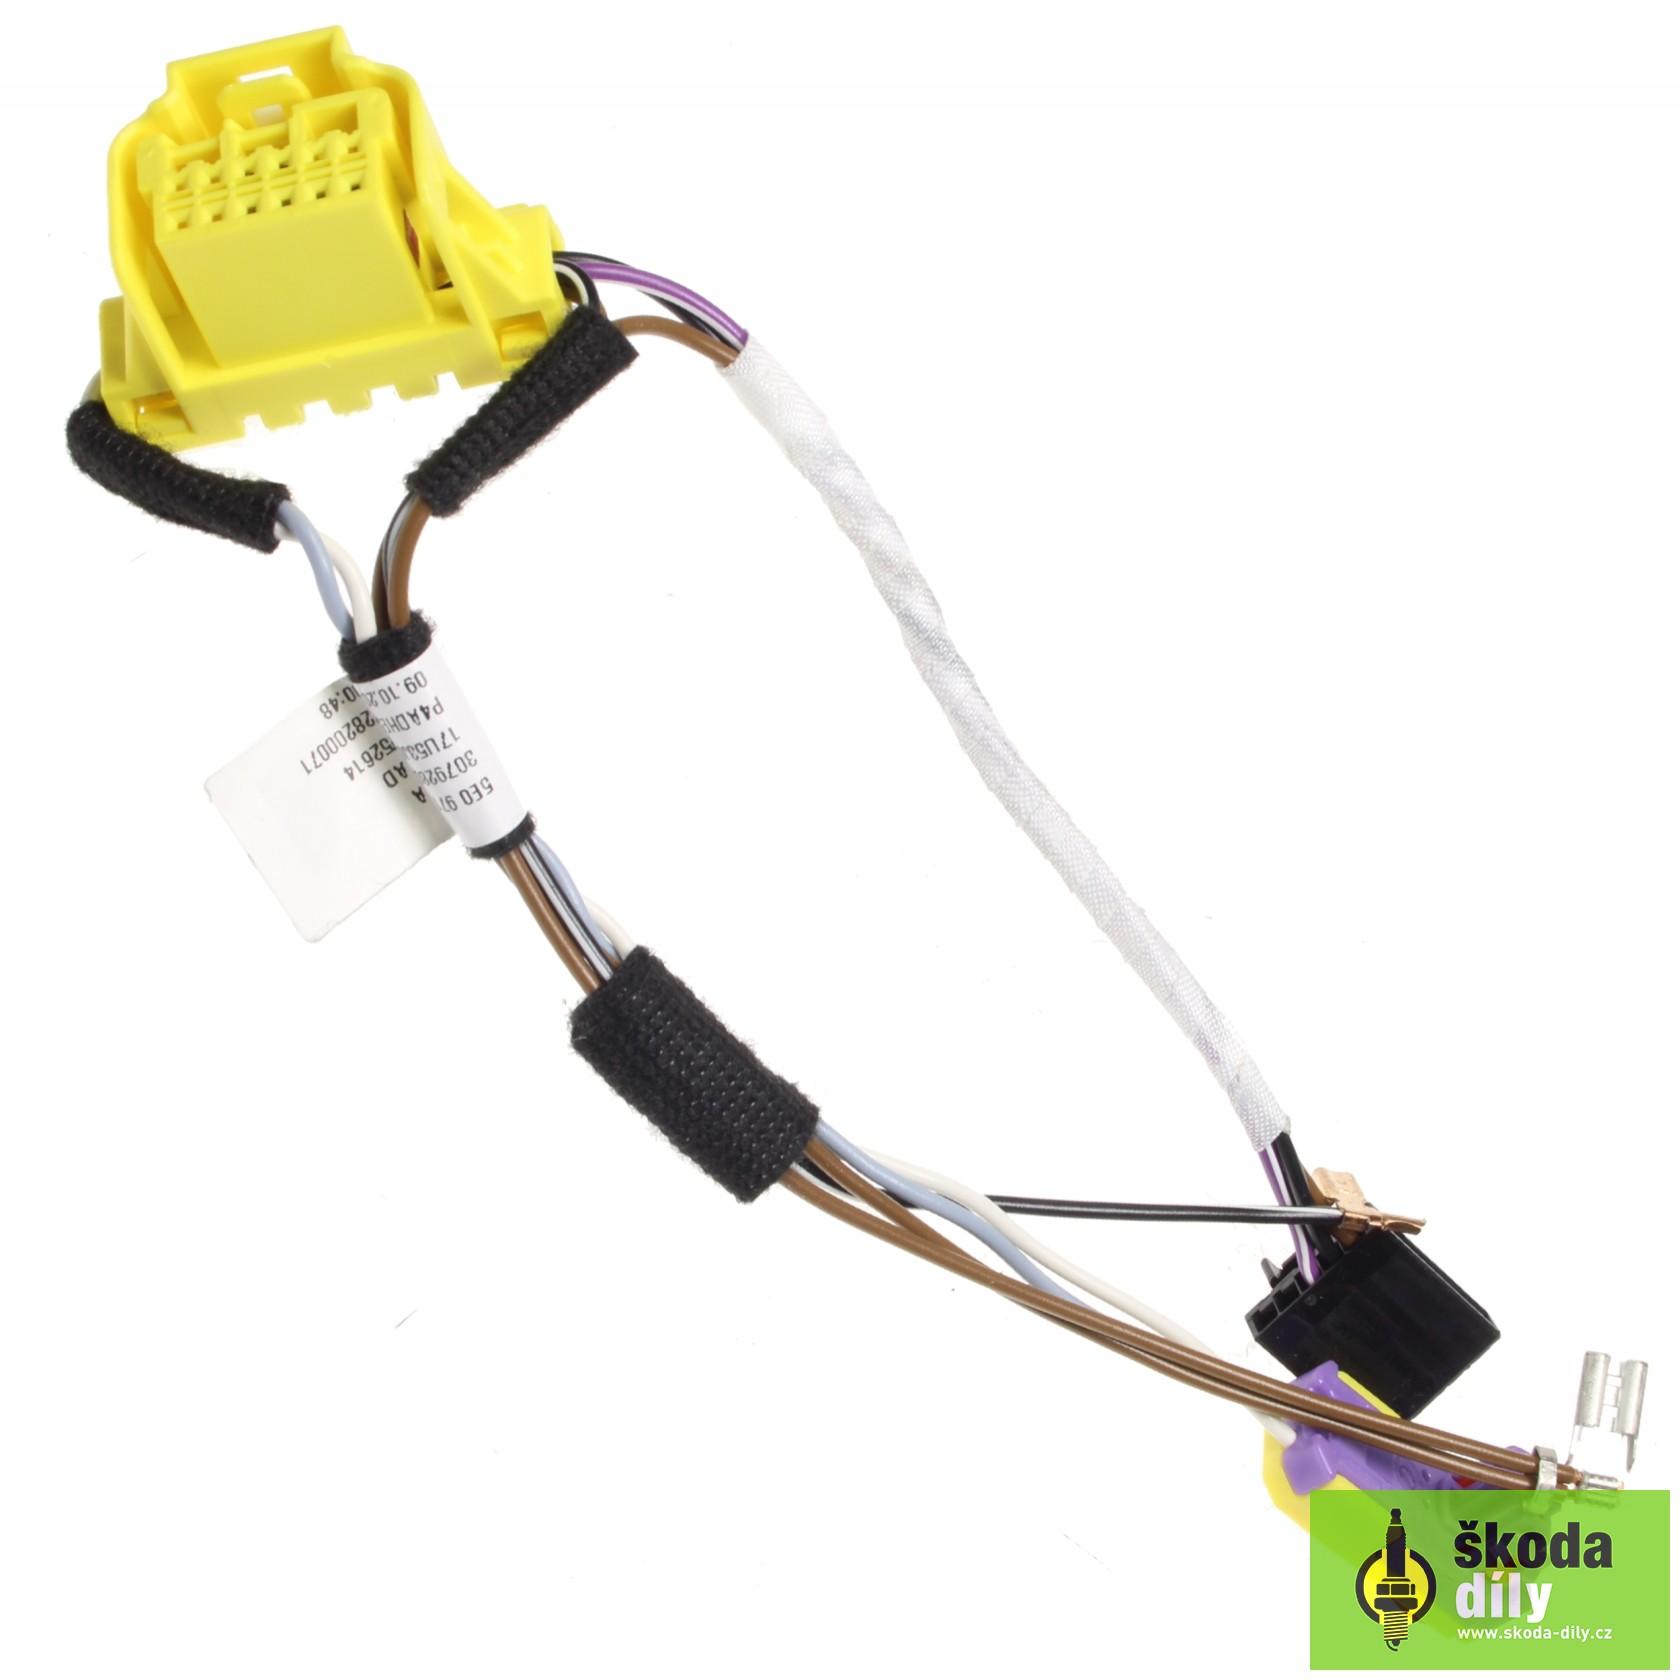 Electrical Wiring Installation Bundle the Steering Wheel Airbag Škoda |  Skoda-Parts.com